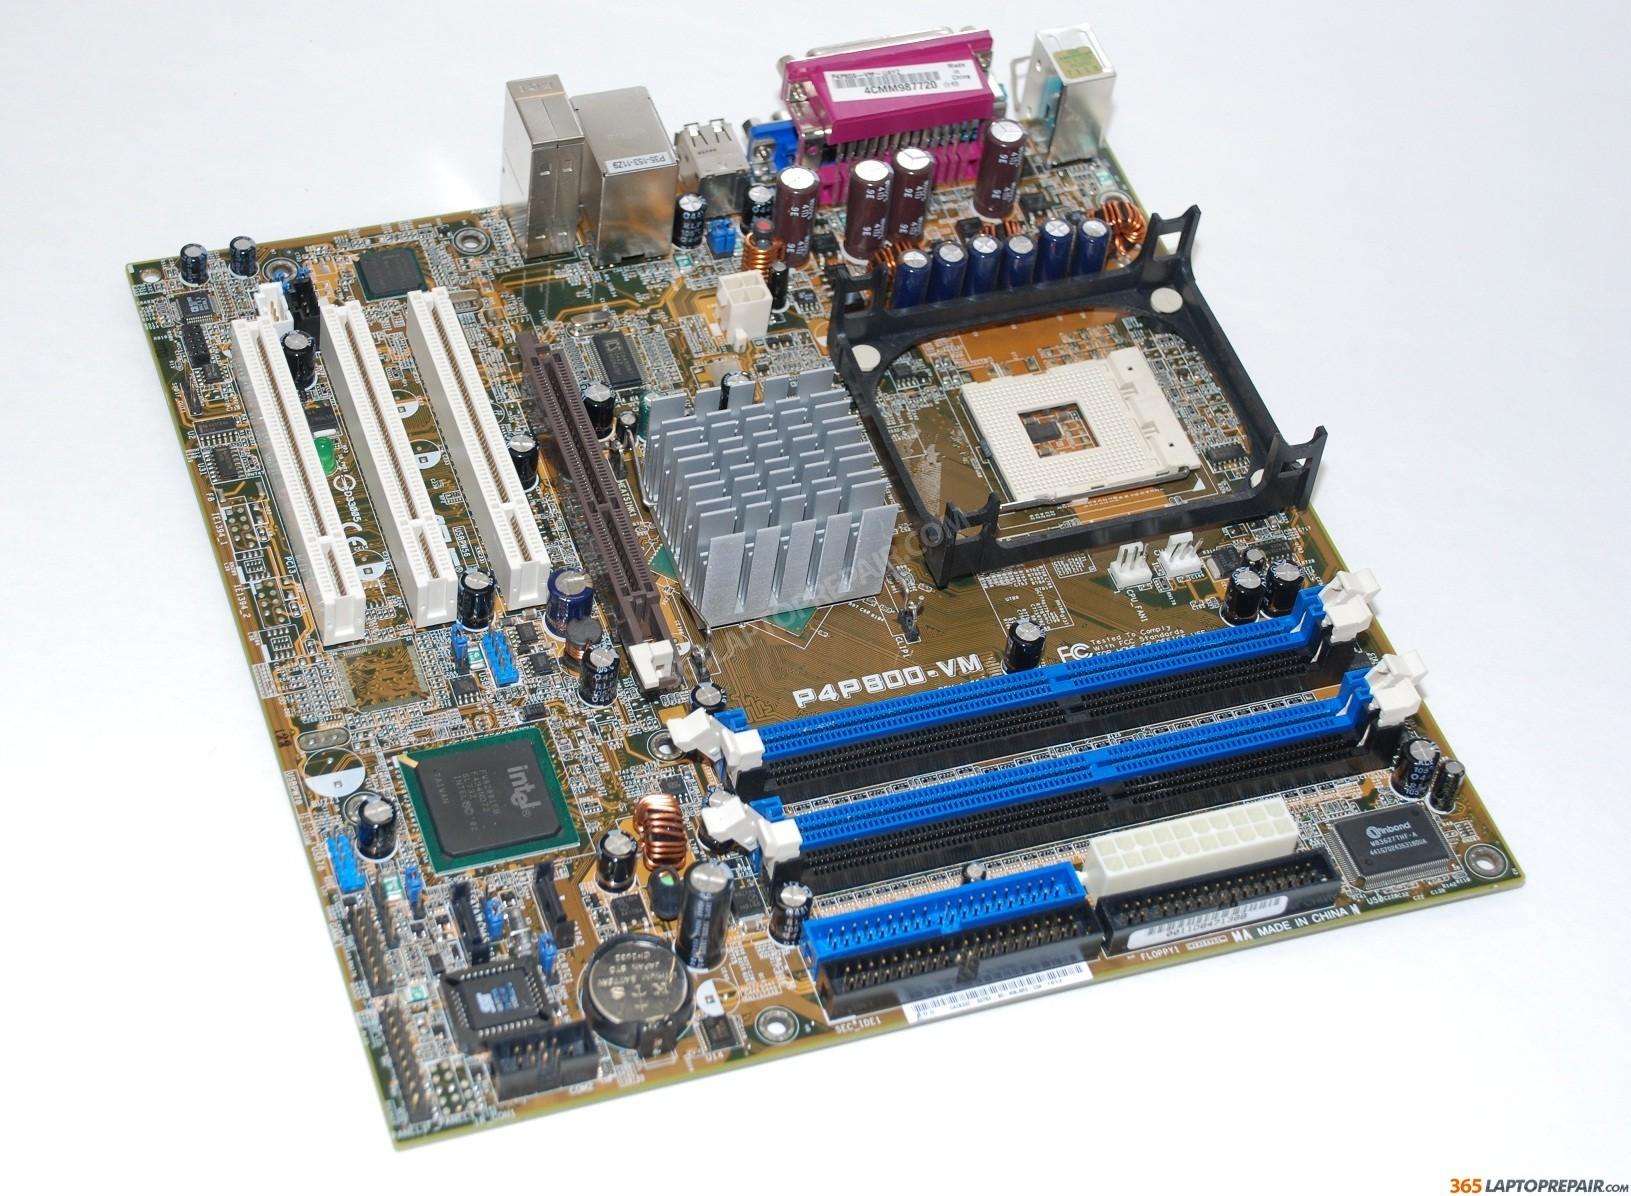 Asus p4pe чипсет intel 845pe процессор pentium 4 fsb 400/533мгцceleron размер, - atx форм-фактор, 22,9мм x 305мм